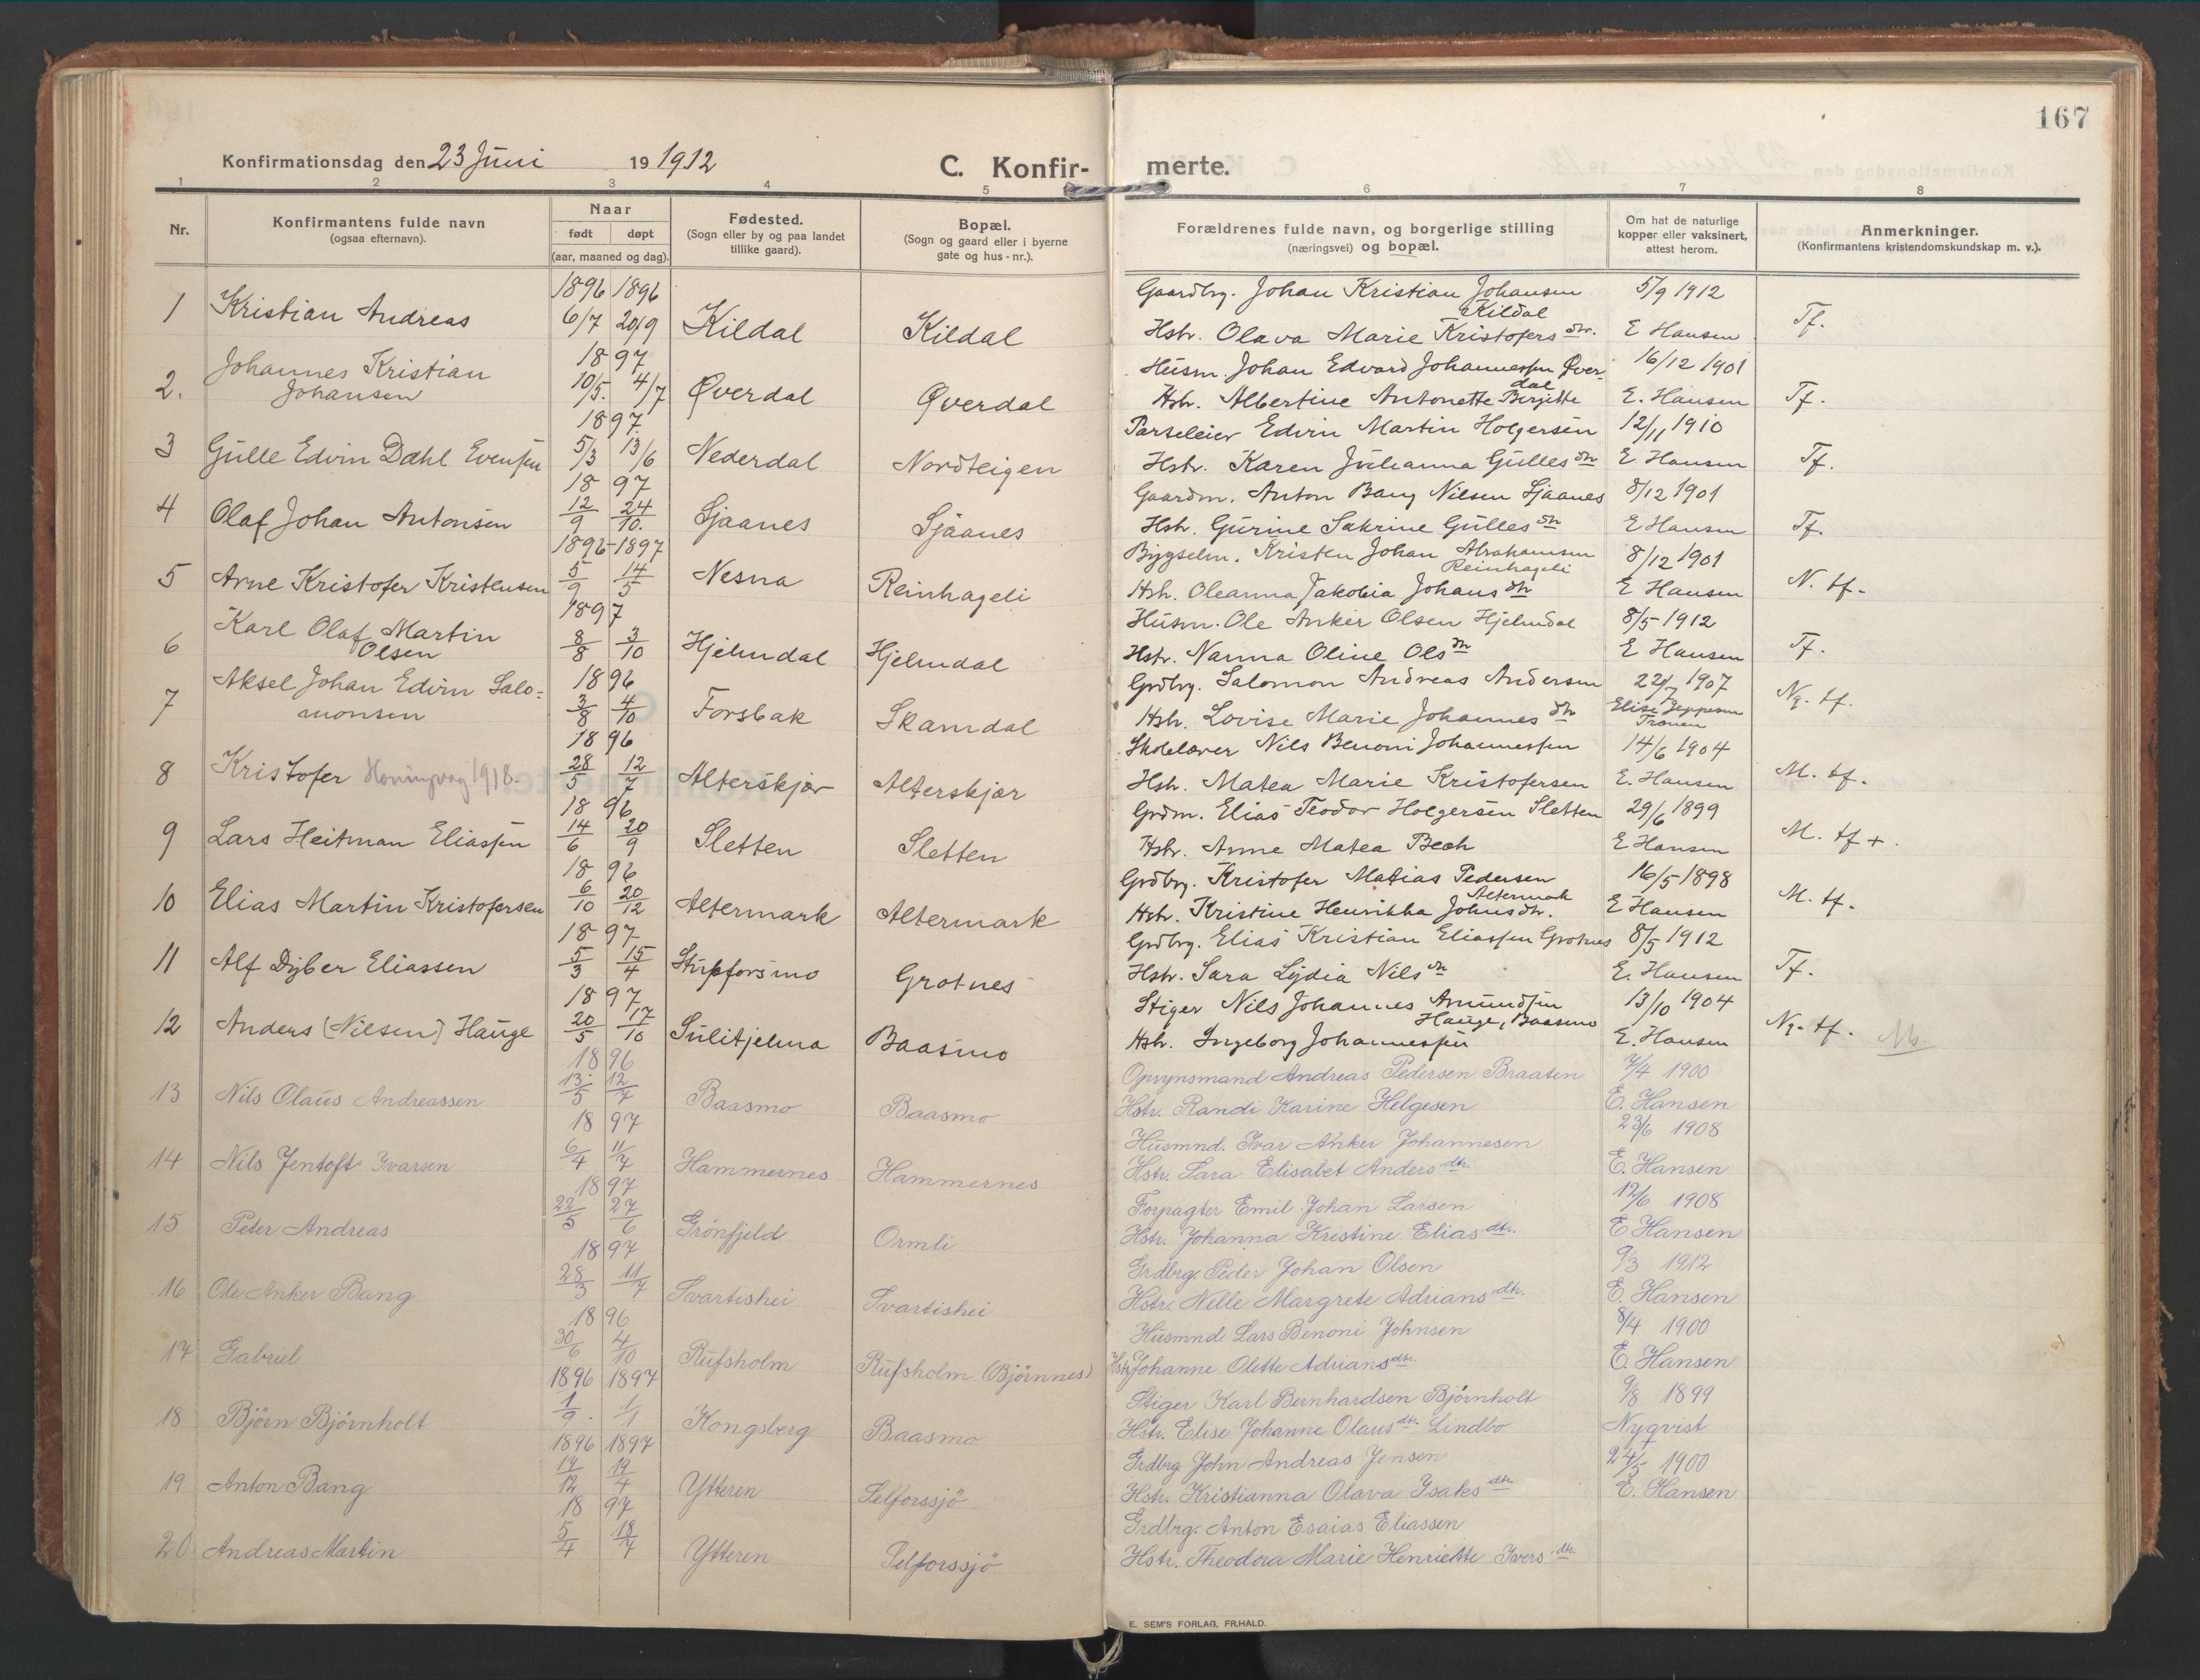 SAT, Ministerialprotokoller, klokkerbøker og fødselsregistre - Nordland, 827/L0404: Ministerialbok nr. 827A16, 1912-1925, s. 167